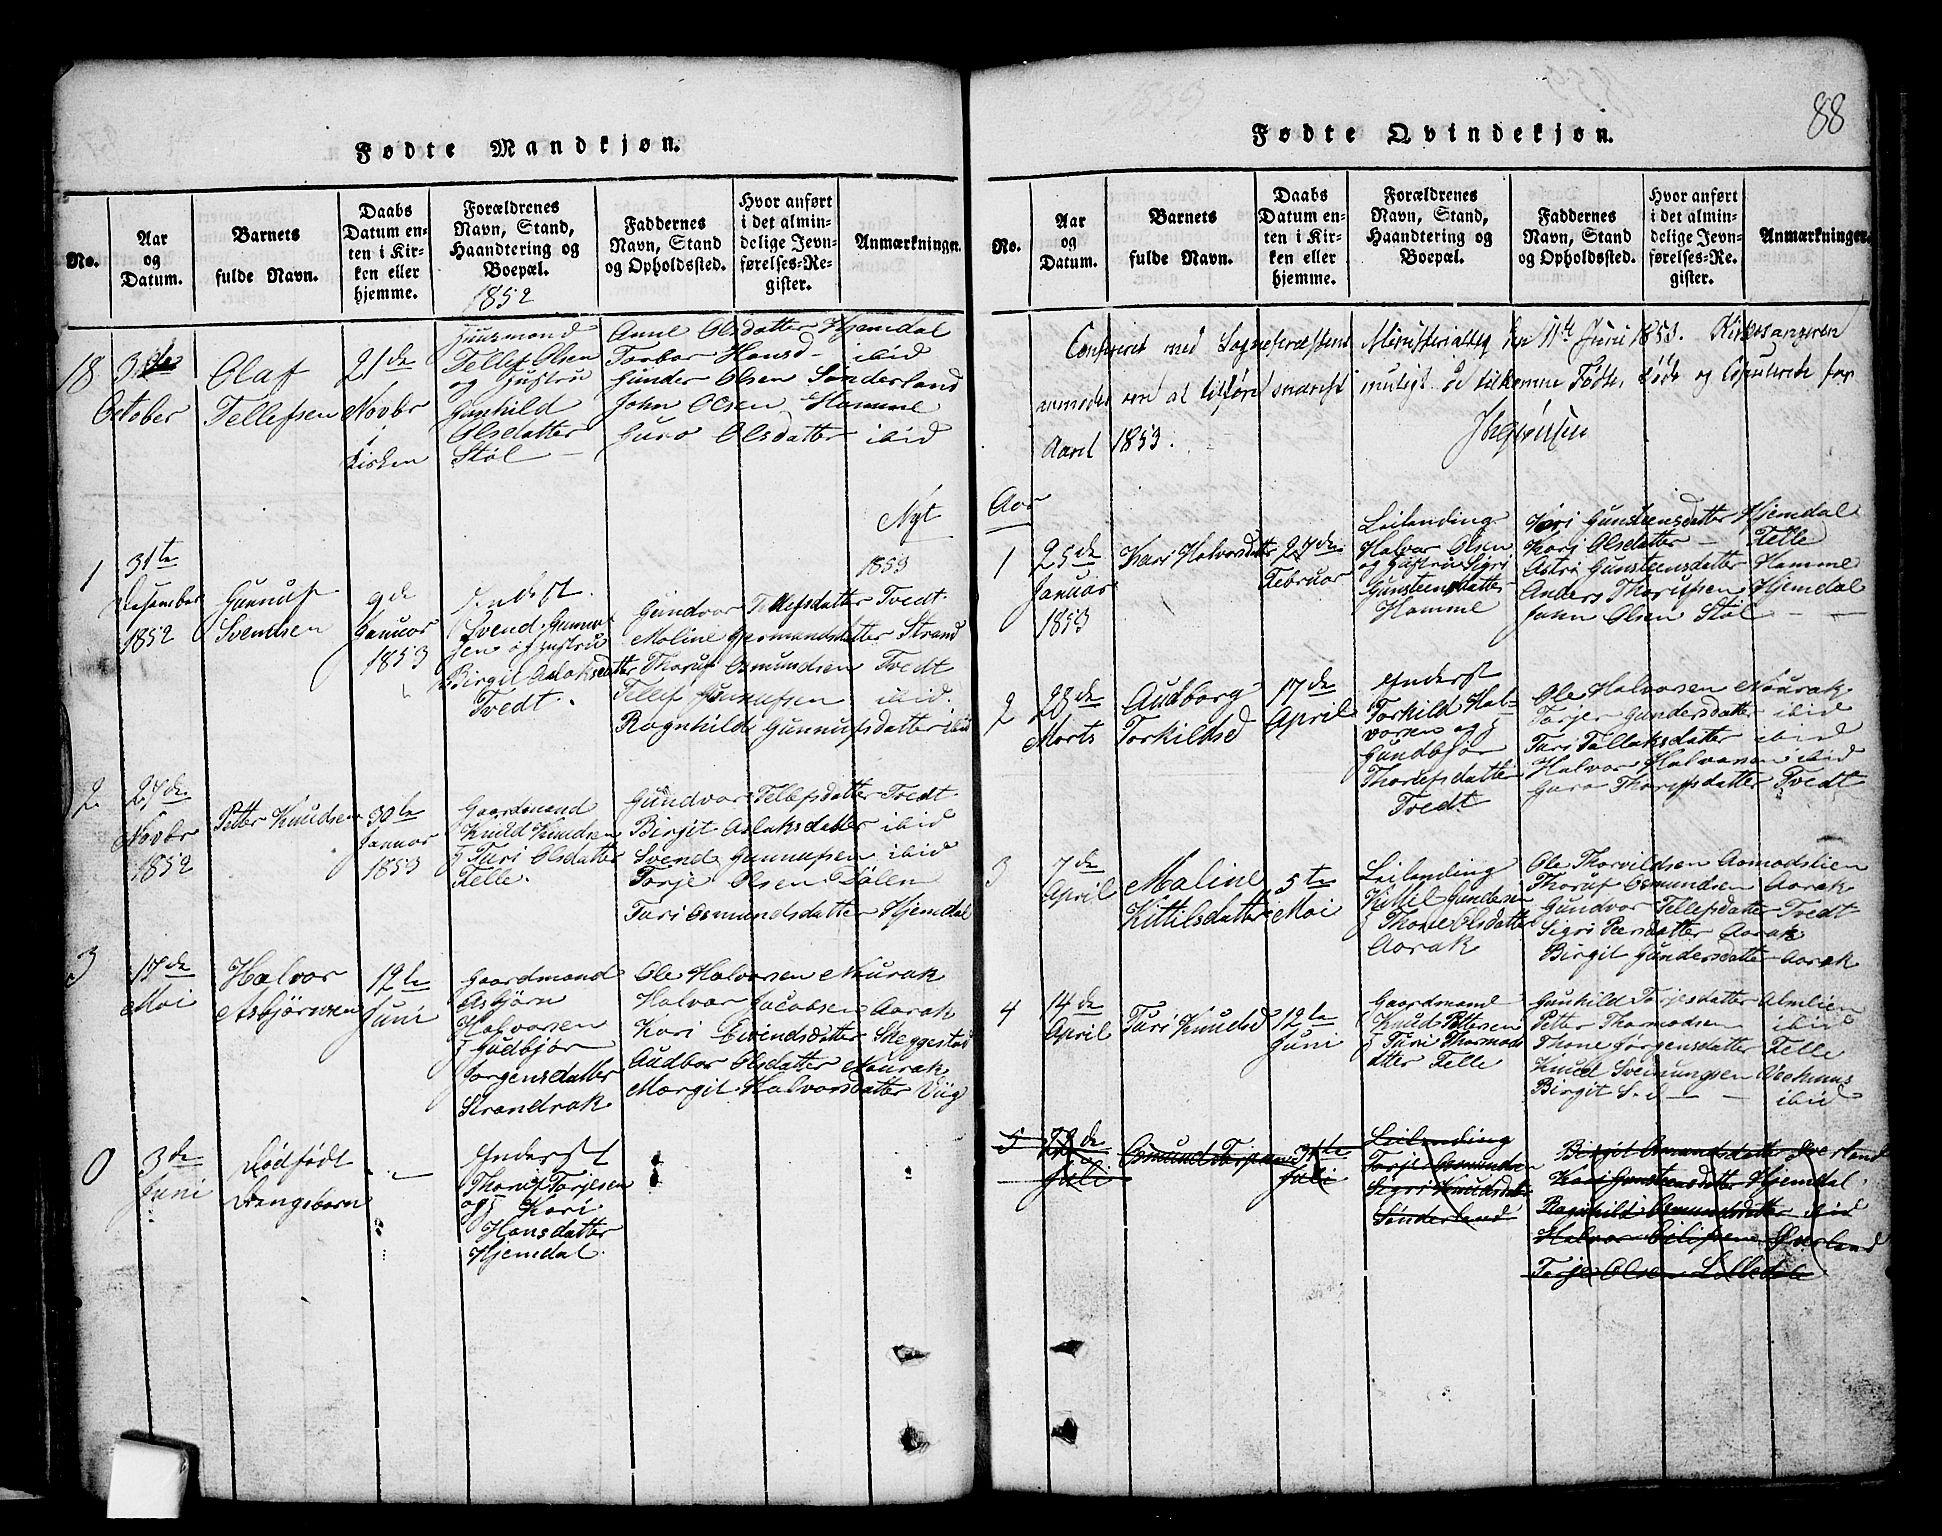 SAKO, Nissedal kirkebøker, G/Gb/L0001: Klokkerbok nr. II 1, 1814-1862, s. 88